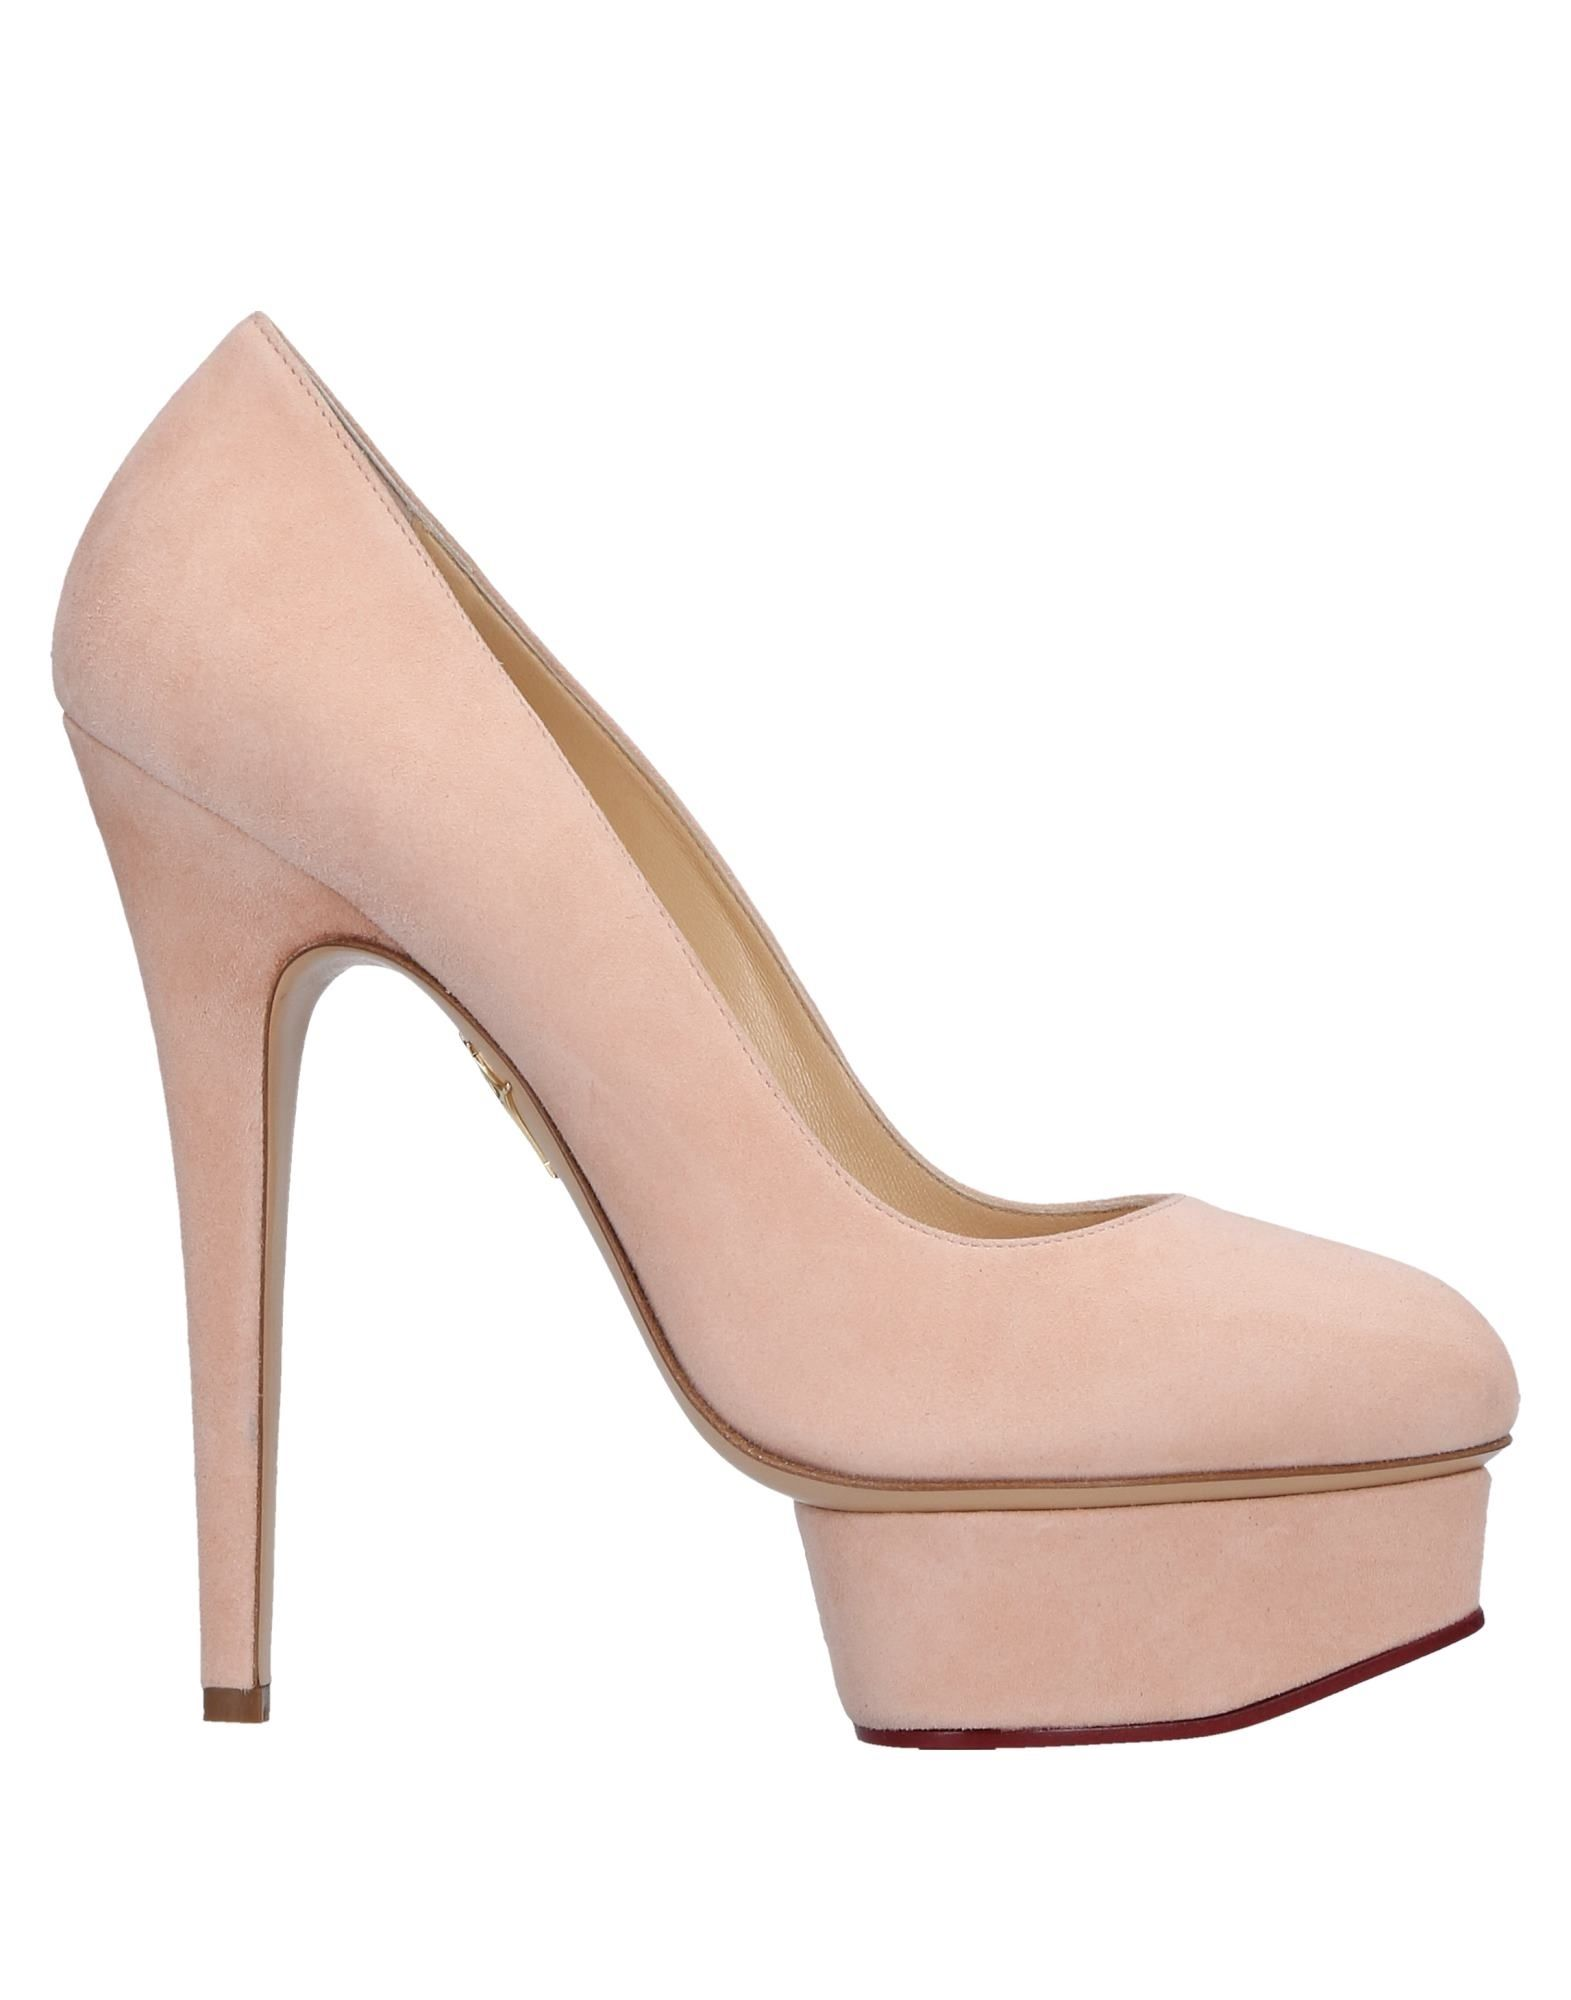 Rabatt Schuhe Charlotte Olympia Pumps Damen  11536592SE